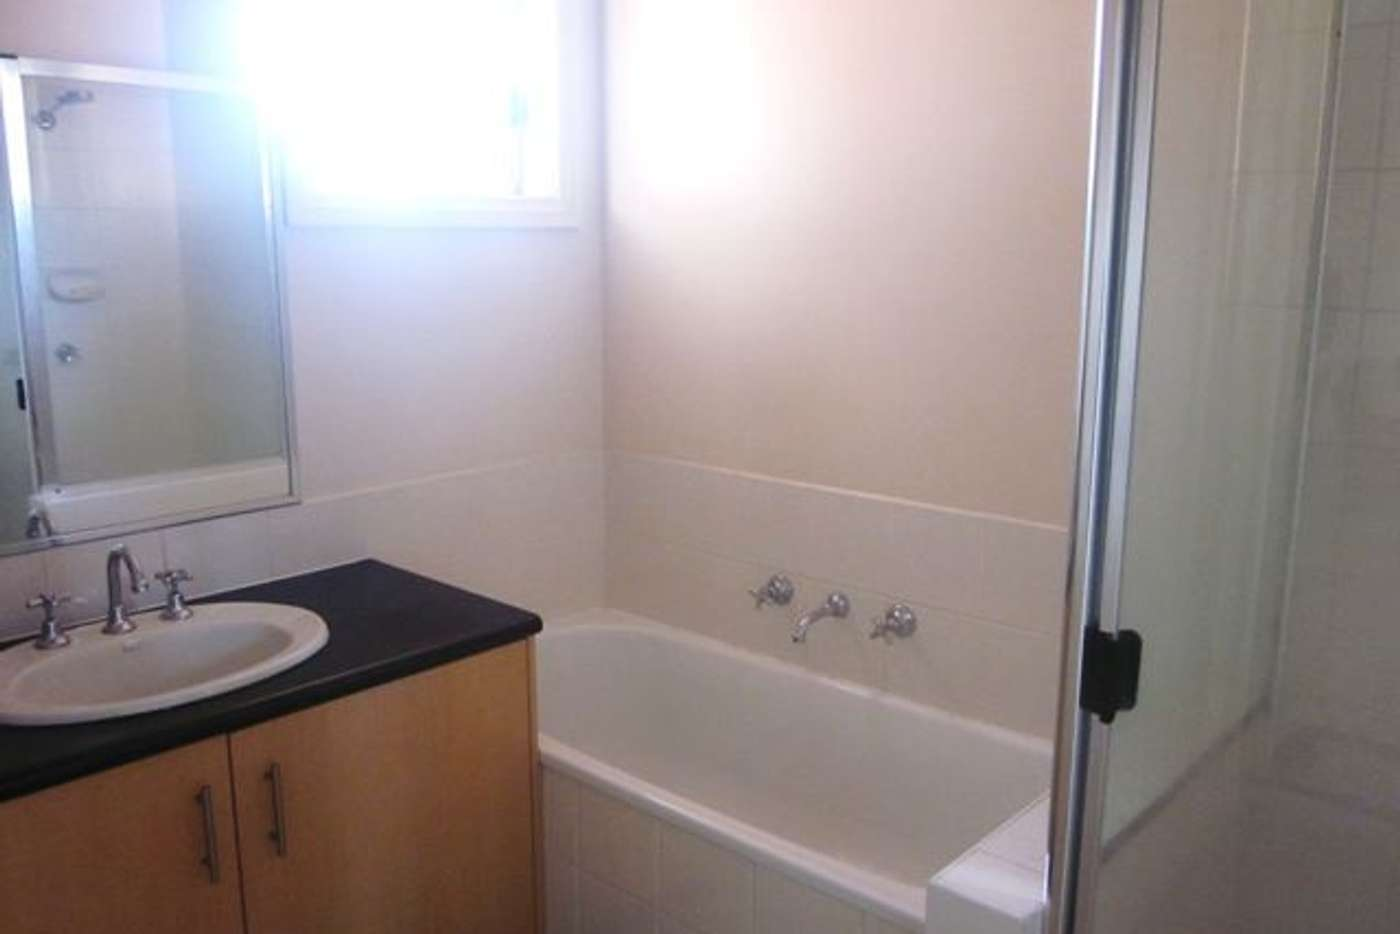 Sixth view of Homely unit listing, 3/11 Leonard Avenue, Glenroy VIC 3046